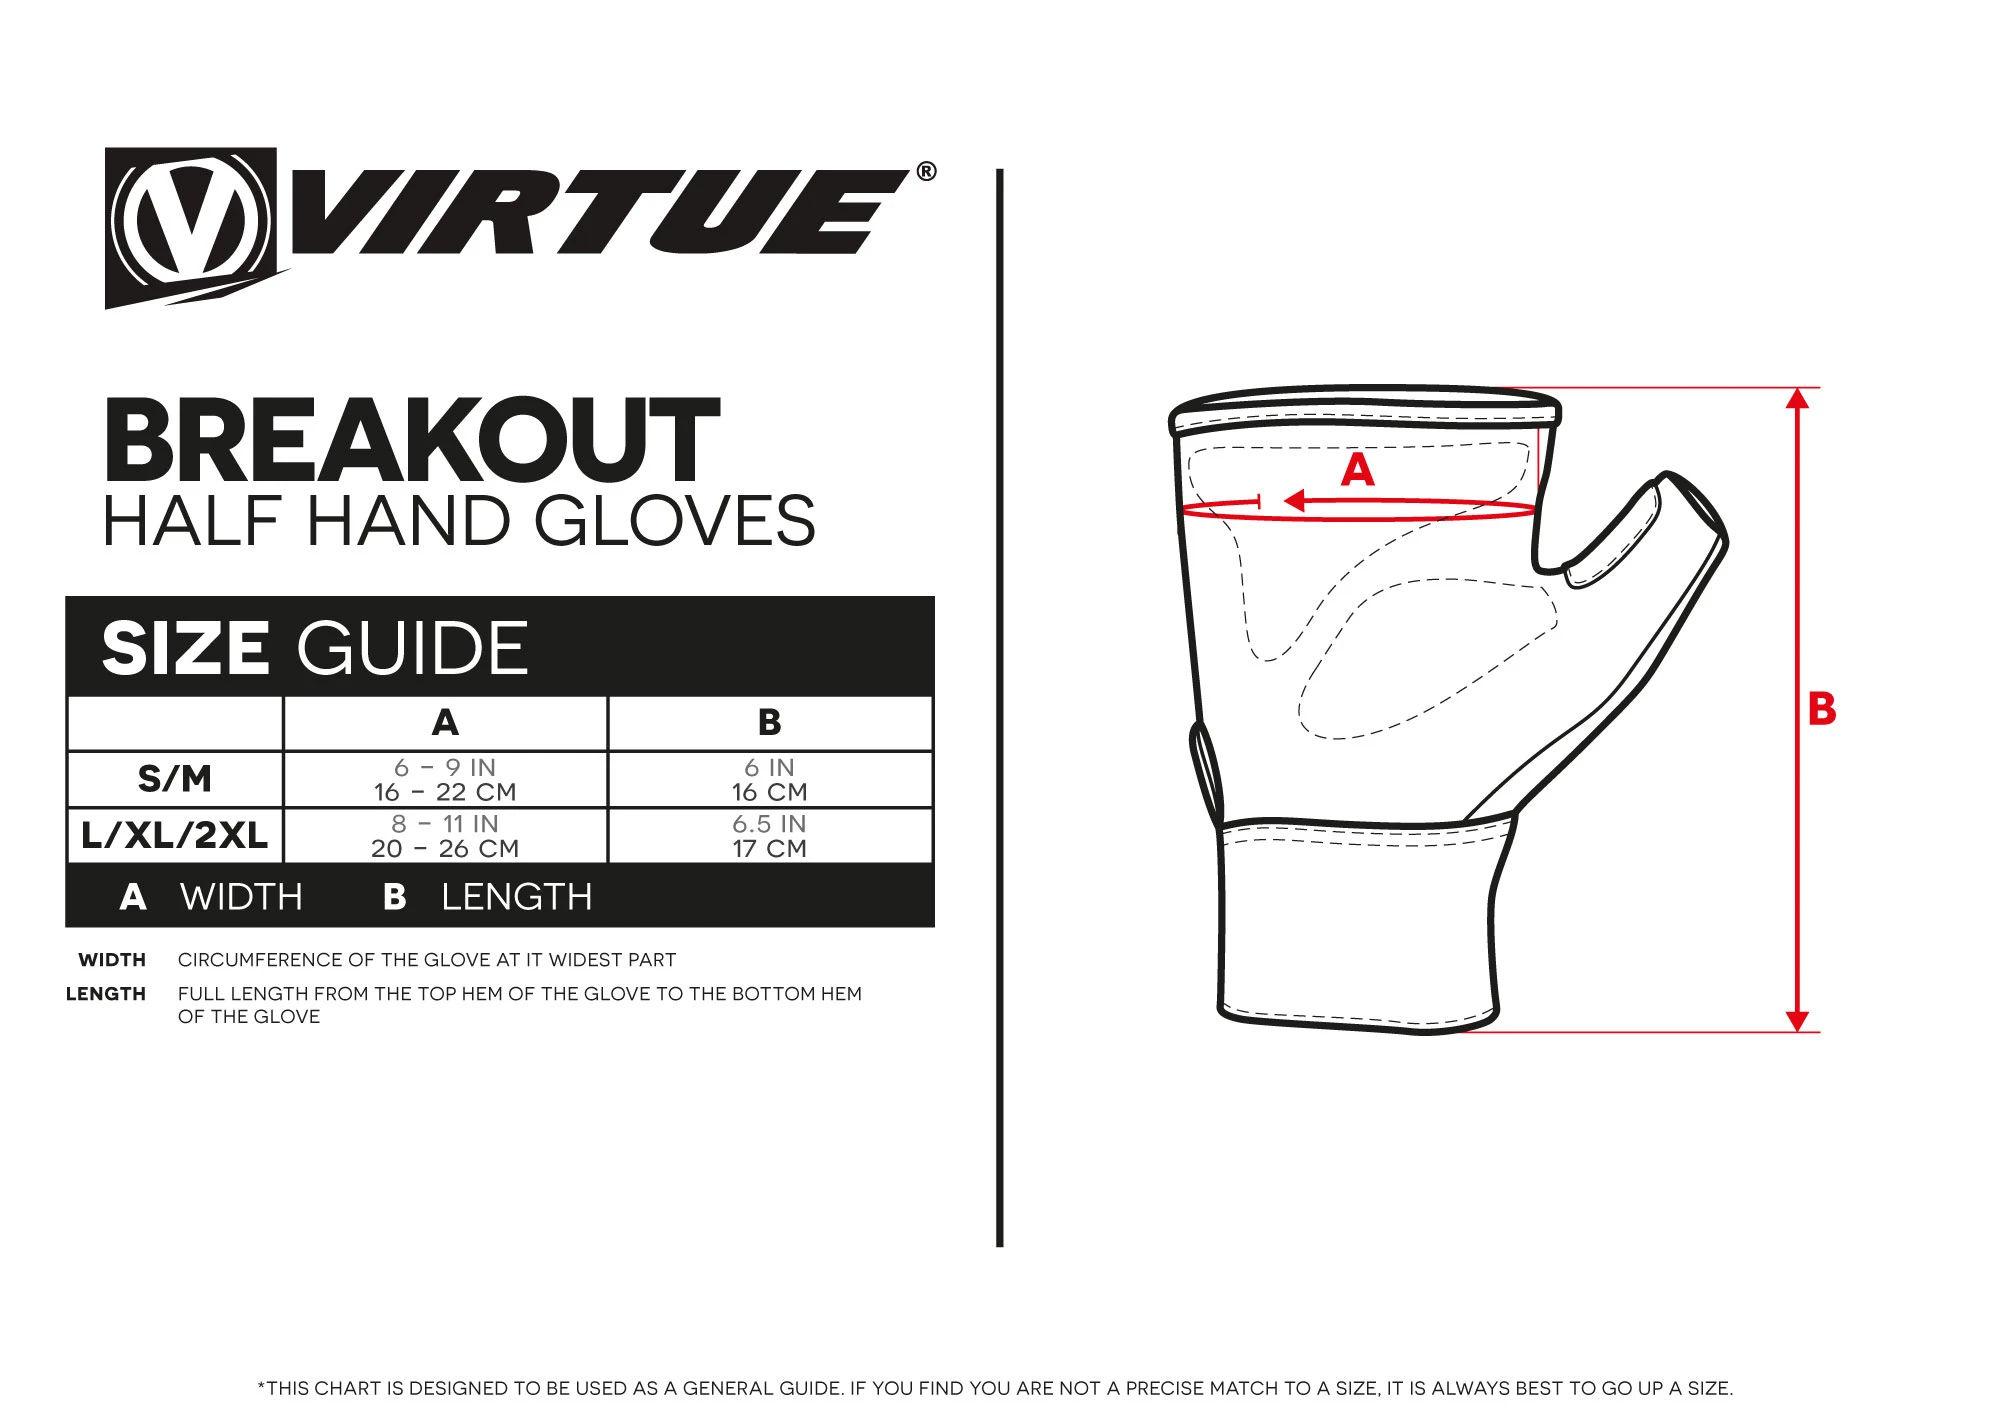 Virtue Breakot Half Hand Gloves